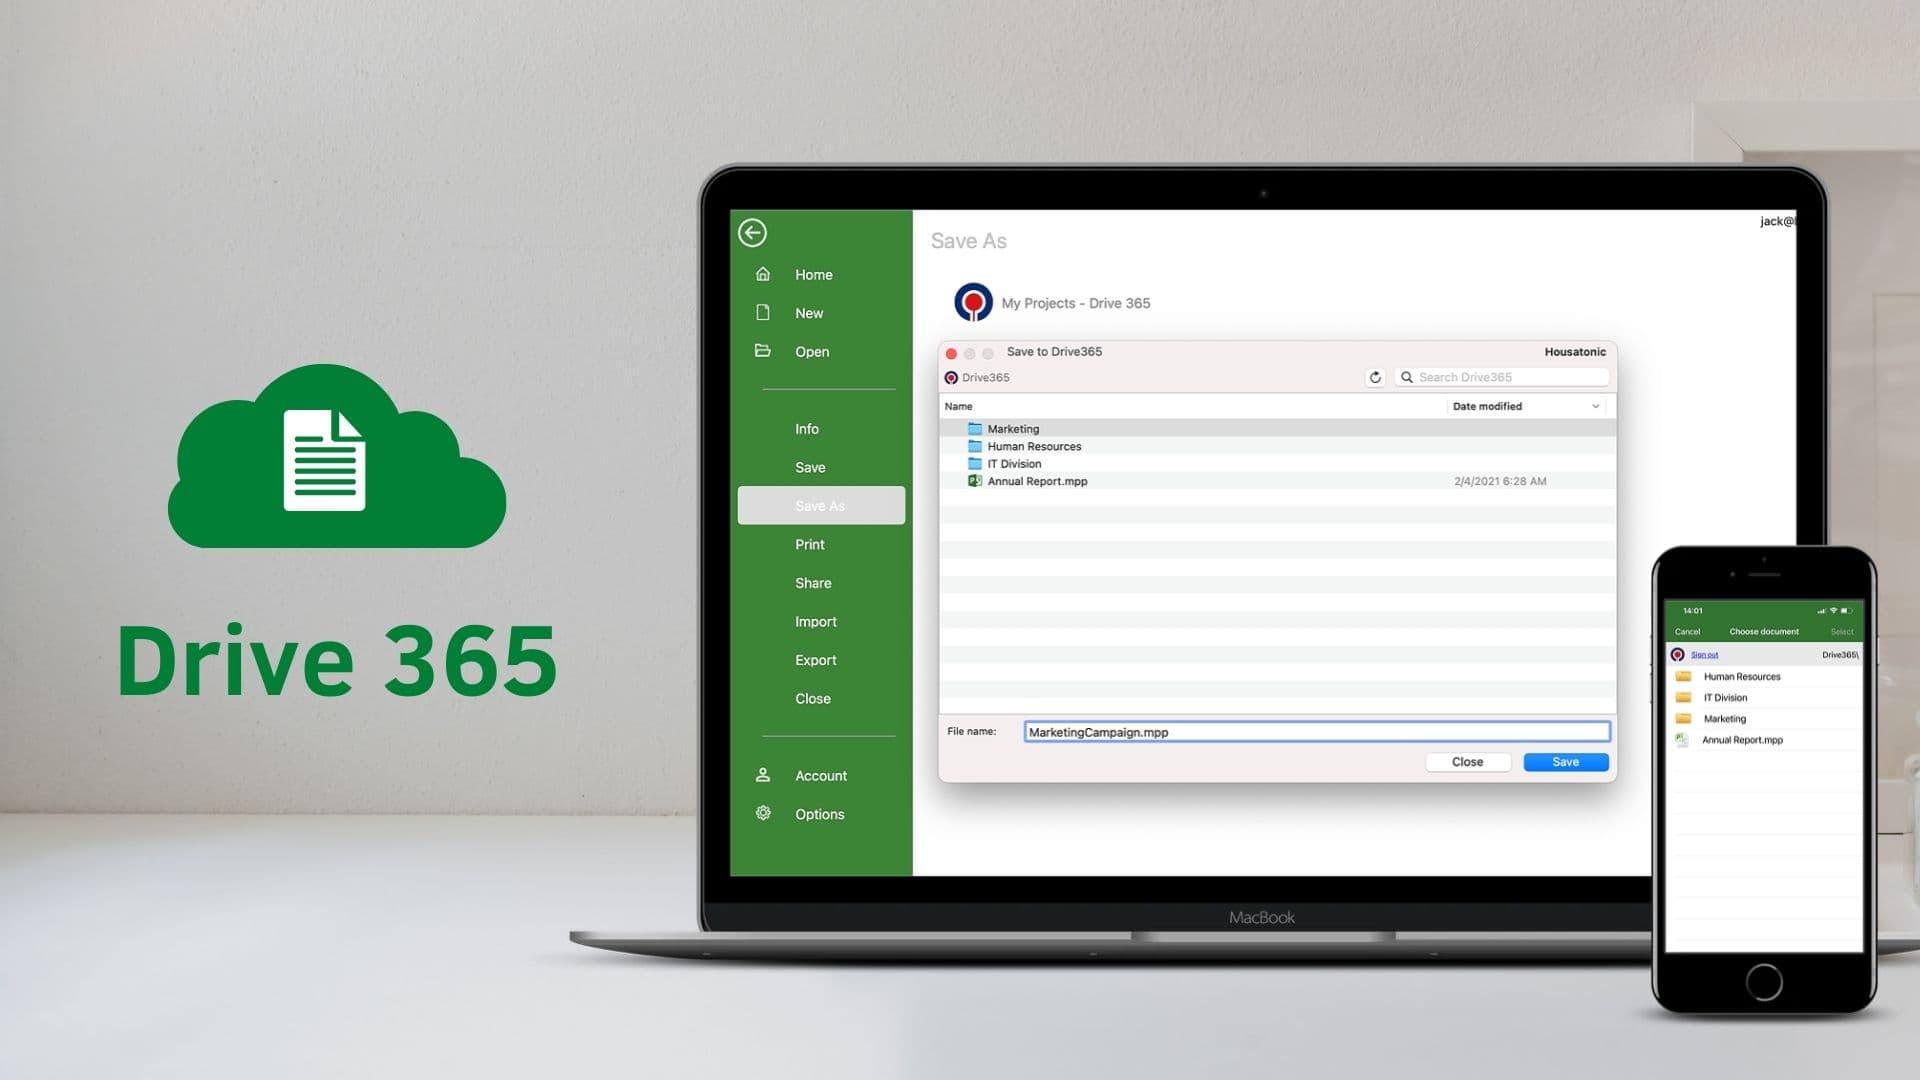 Drive 365 Cloud Storage